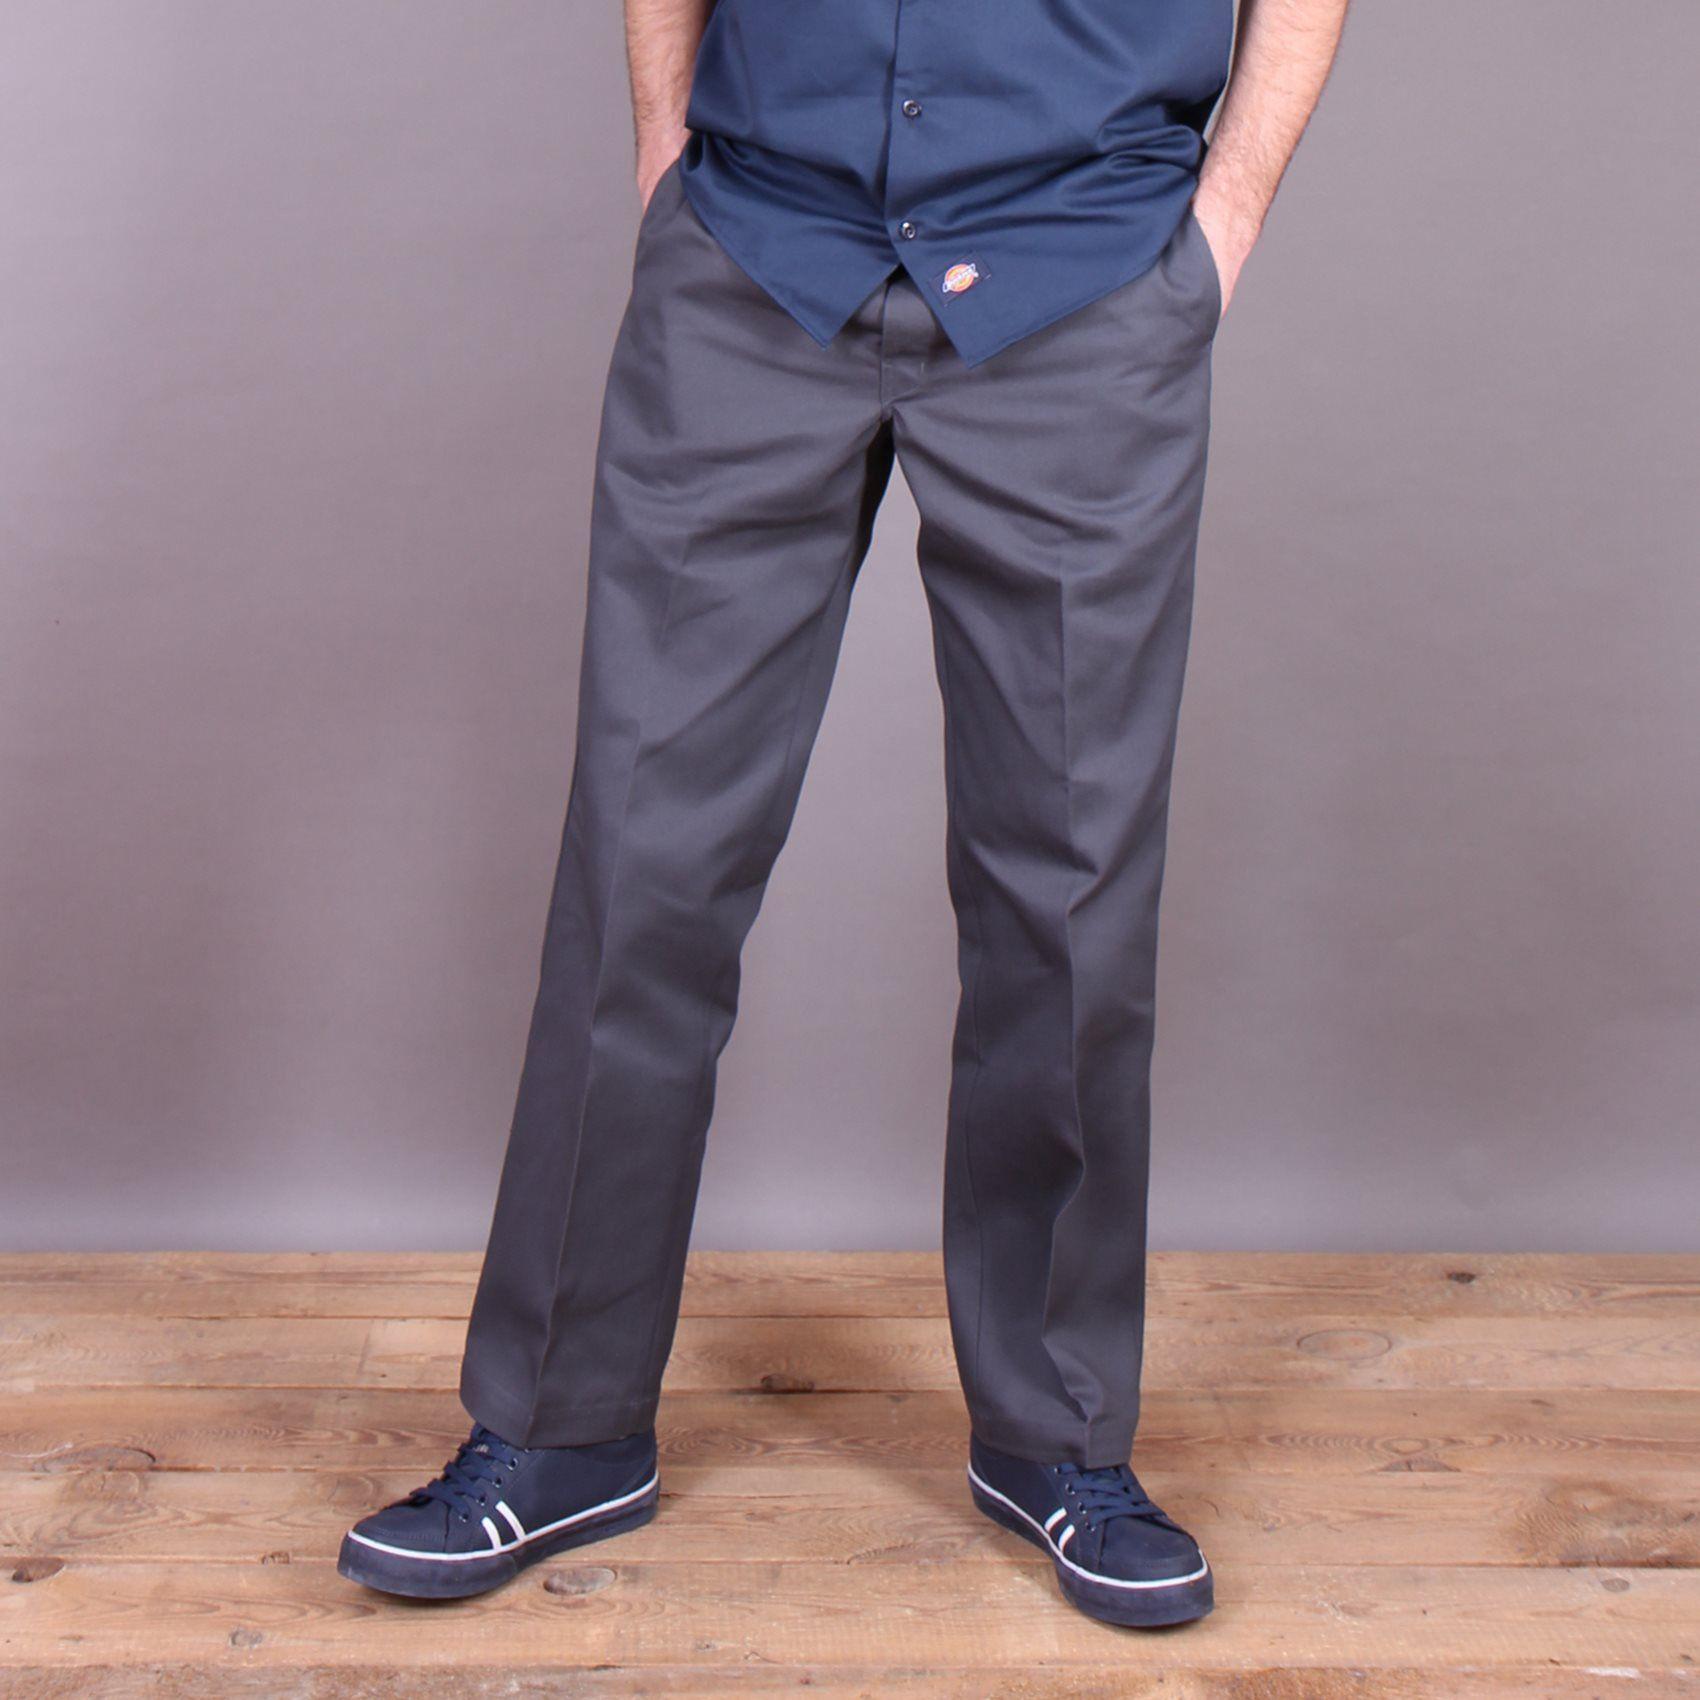 Chinosy spodnie męskie Dickies Original 874 Work Pant Charcoal - grafitowe